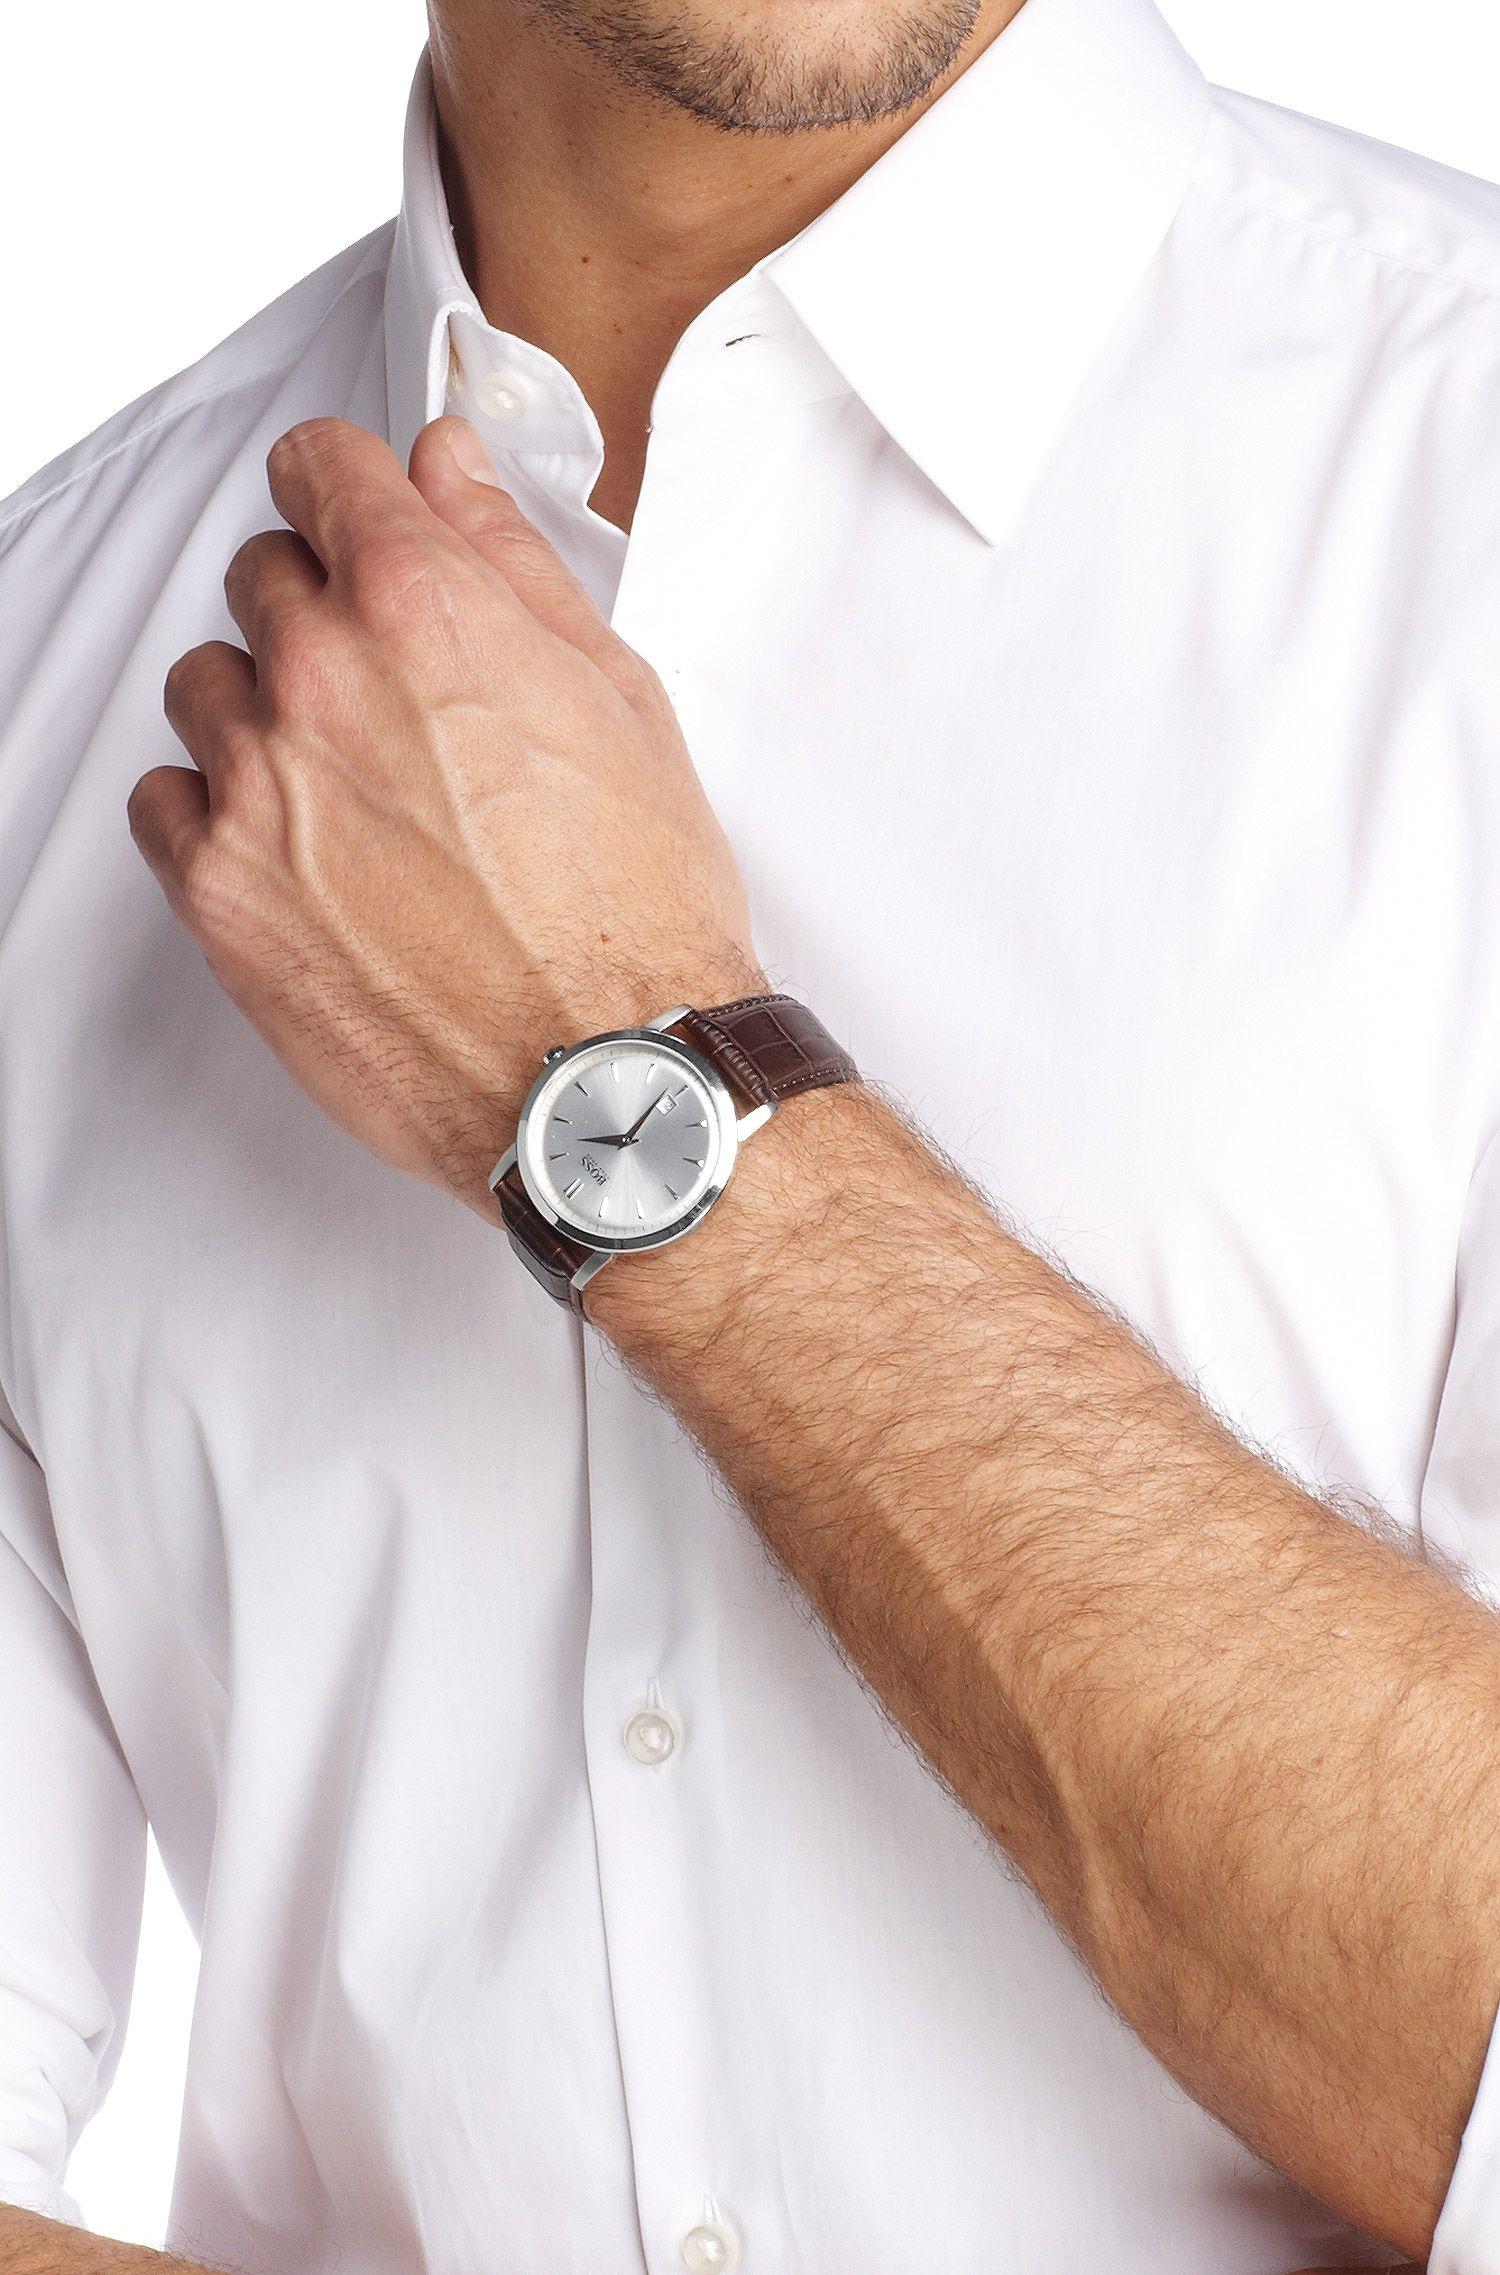 Designer-Uhr ´HB1013` mit Lederarmband